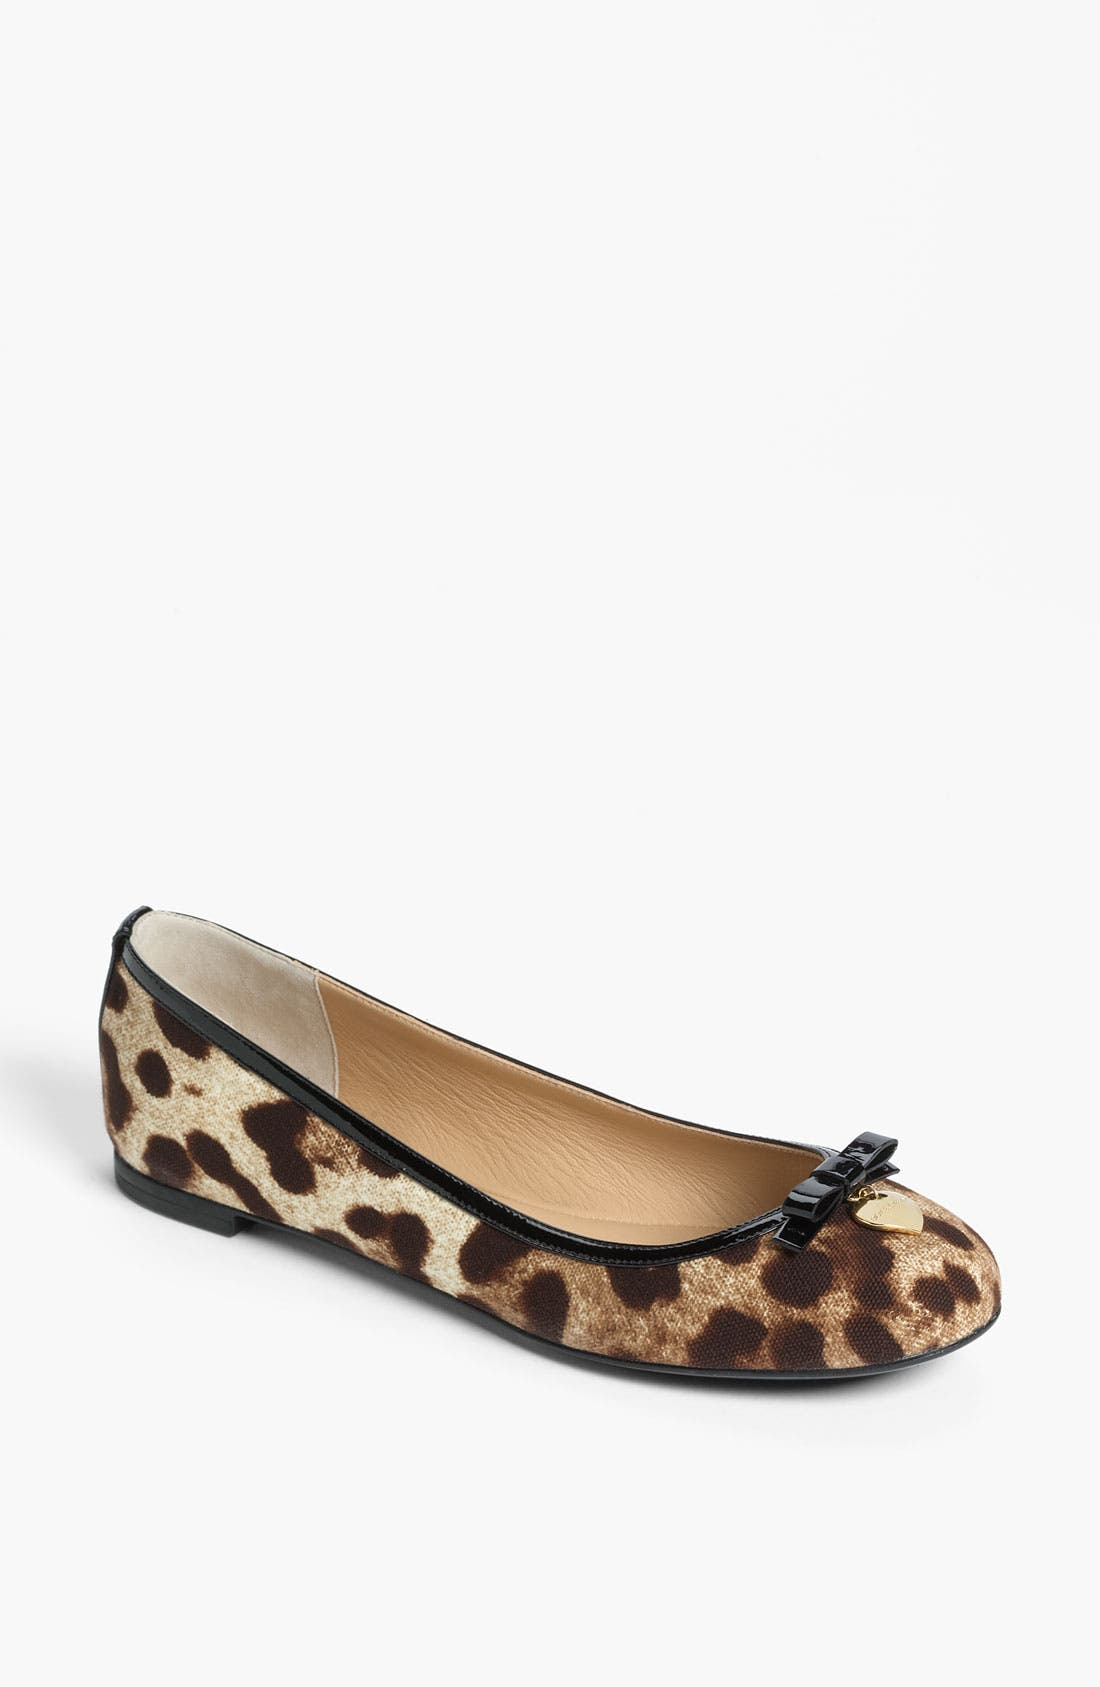 Main Image - Dolce&Gabbana Leopard Print Ballet Flat